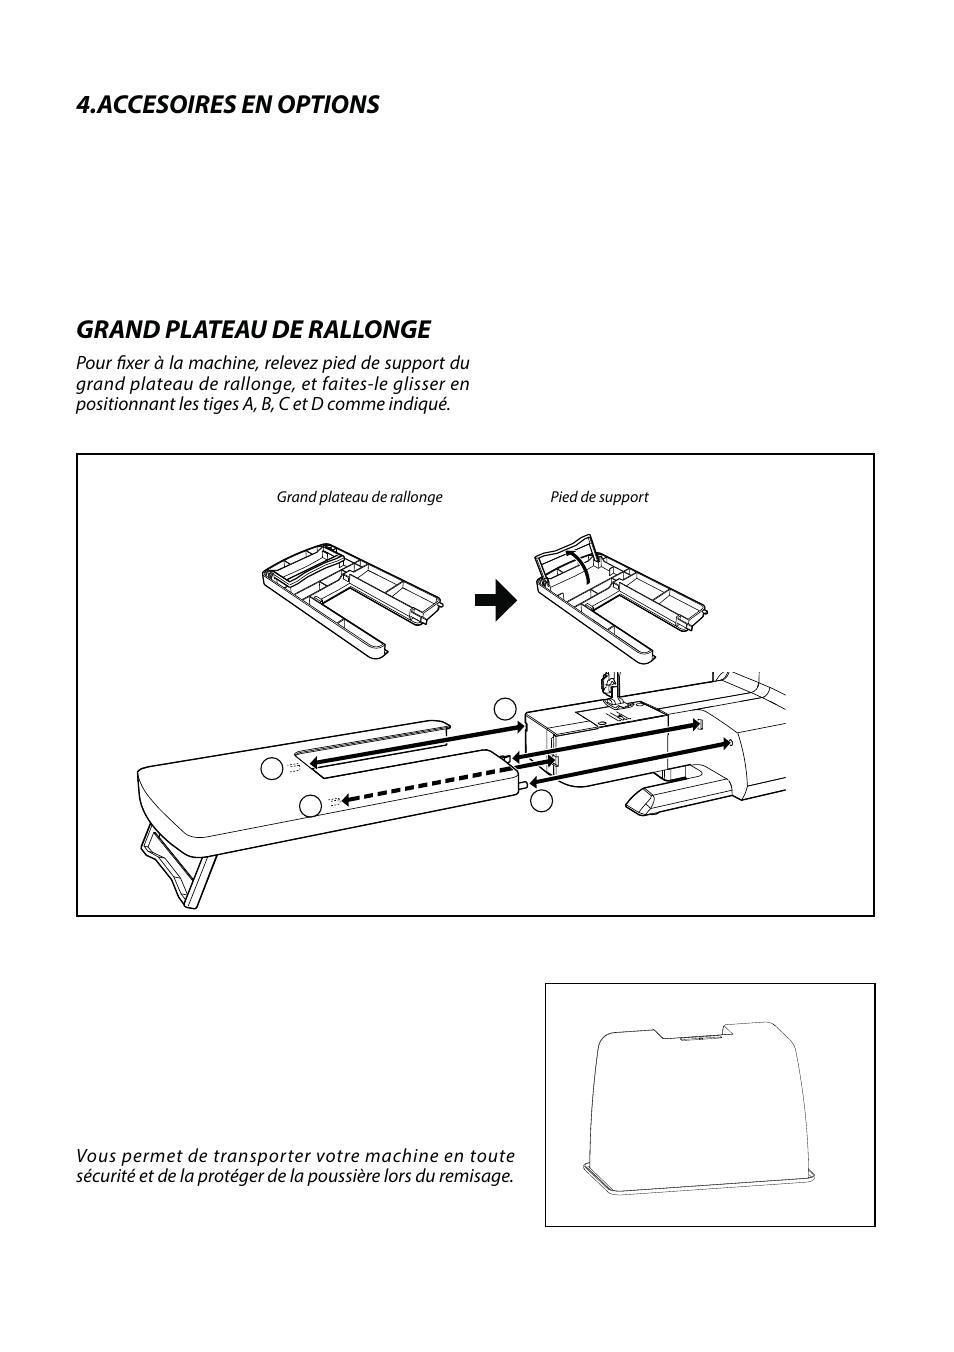 Accesorios De ExtensionOption Accessories Large Base Opción EDYIWH92